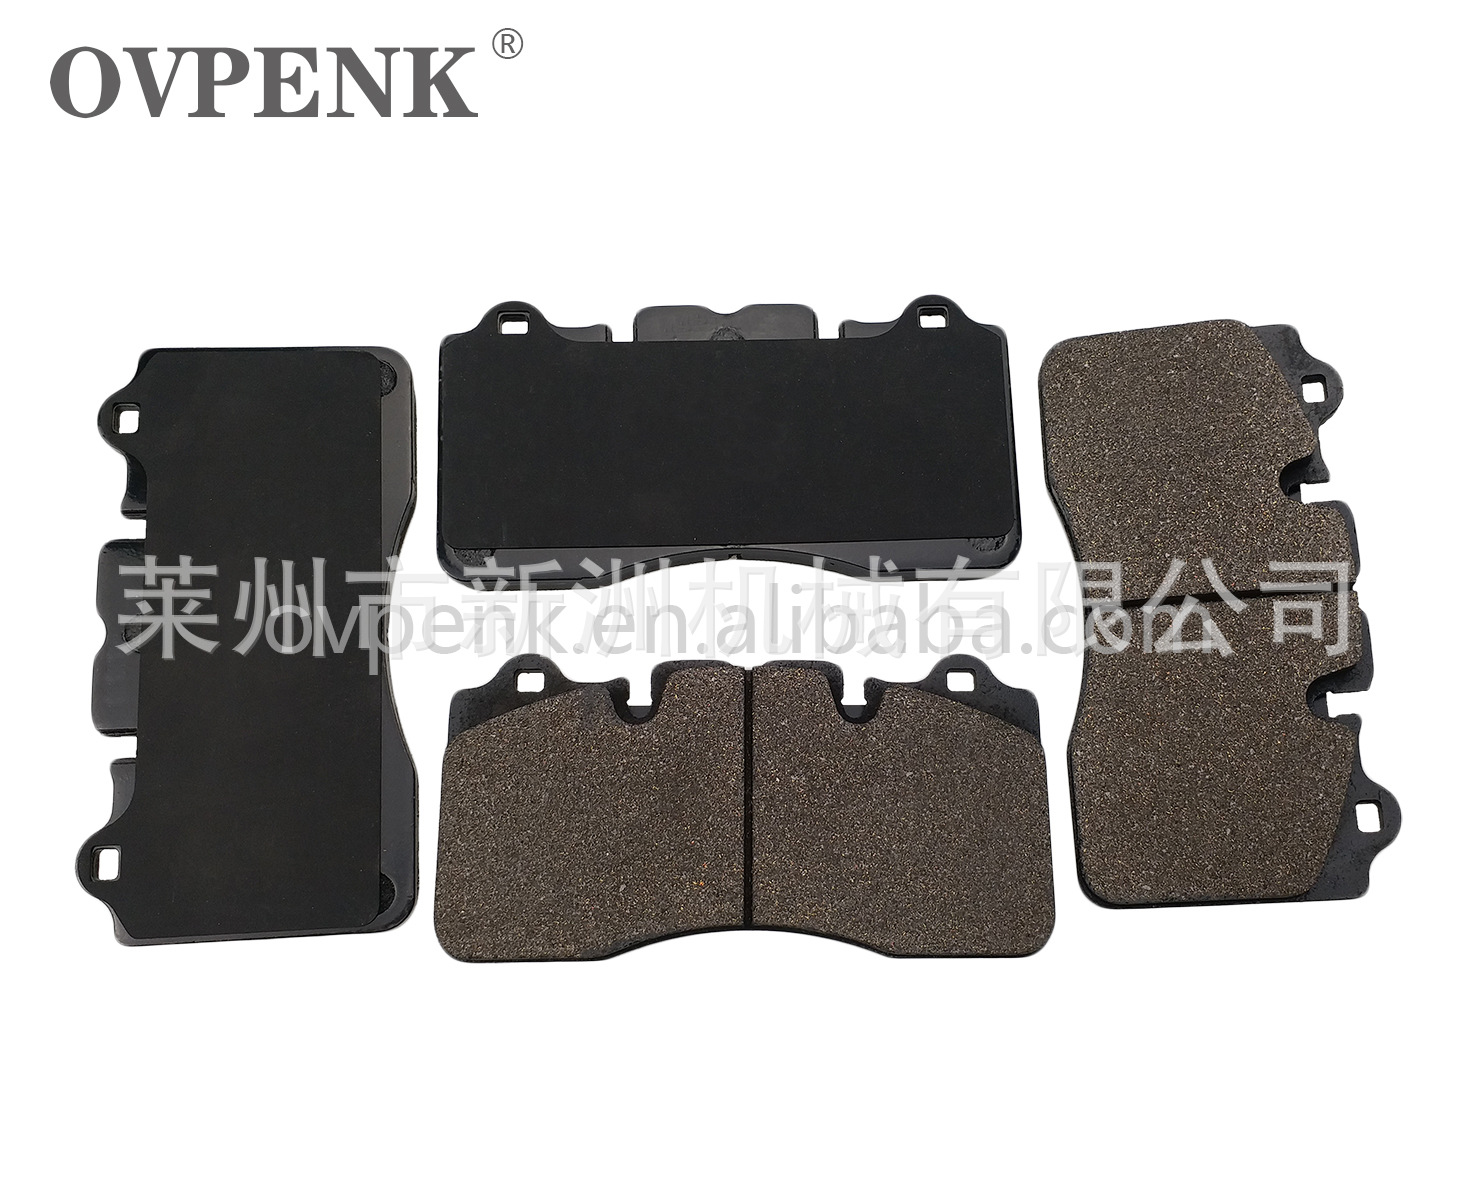 工厂直销刹车片适用于捷豹JaguarXKR-S GT OEM T2R11420 70003329